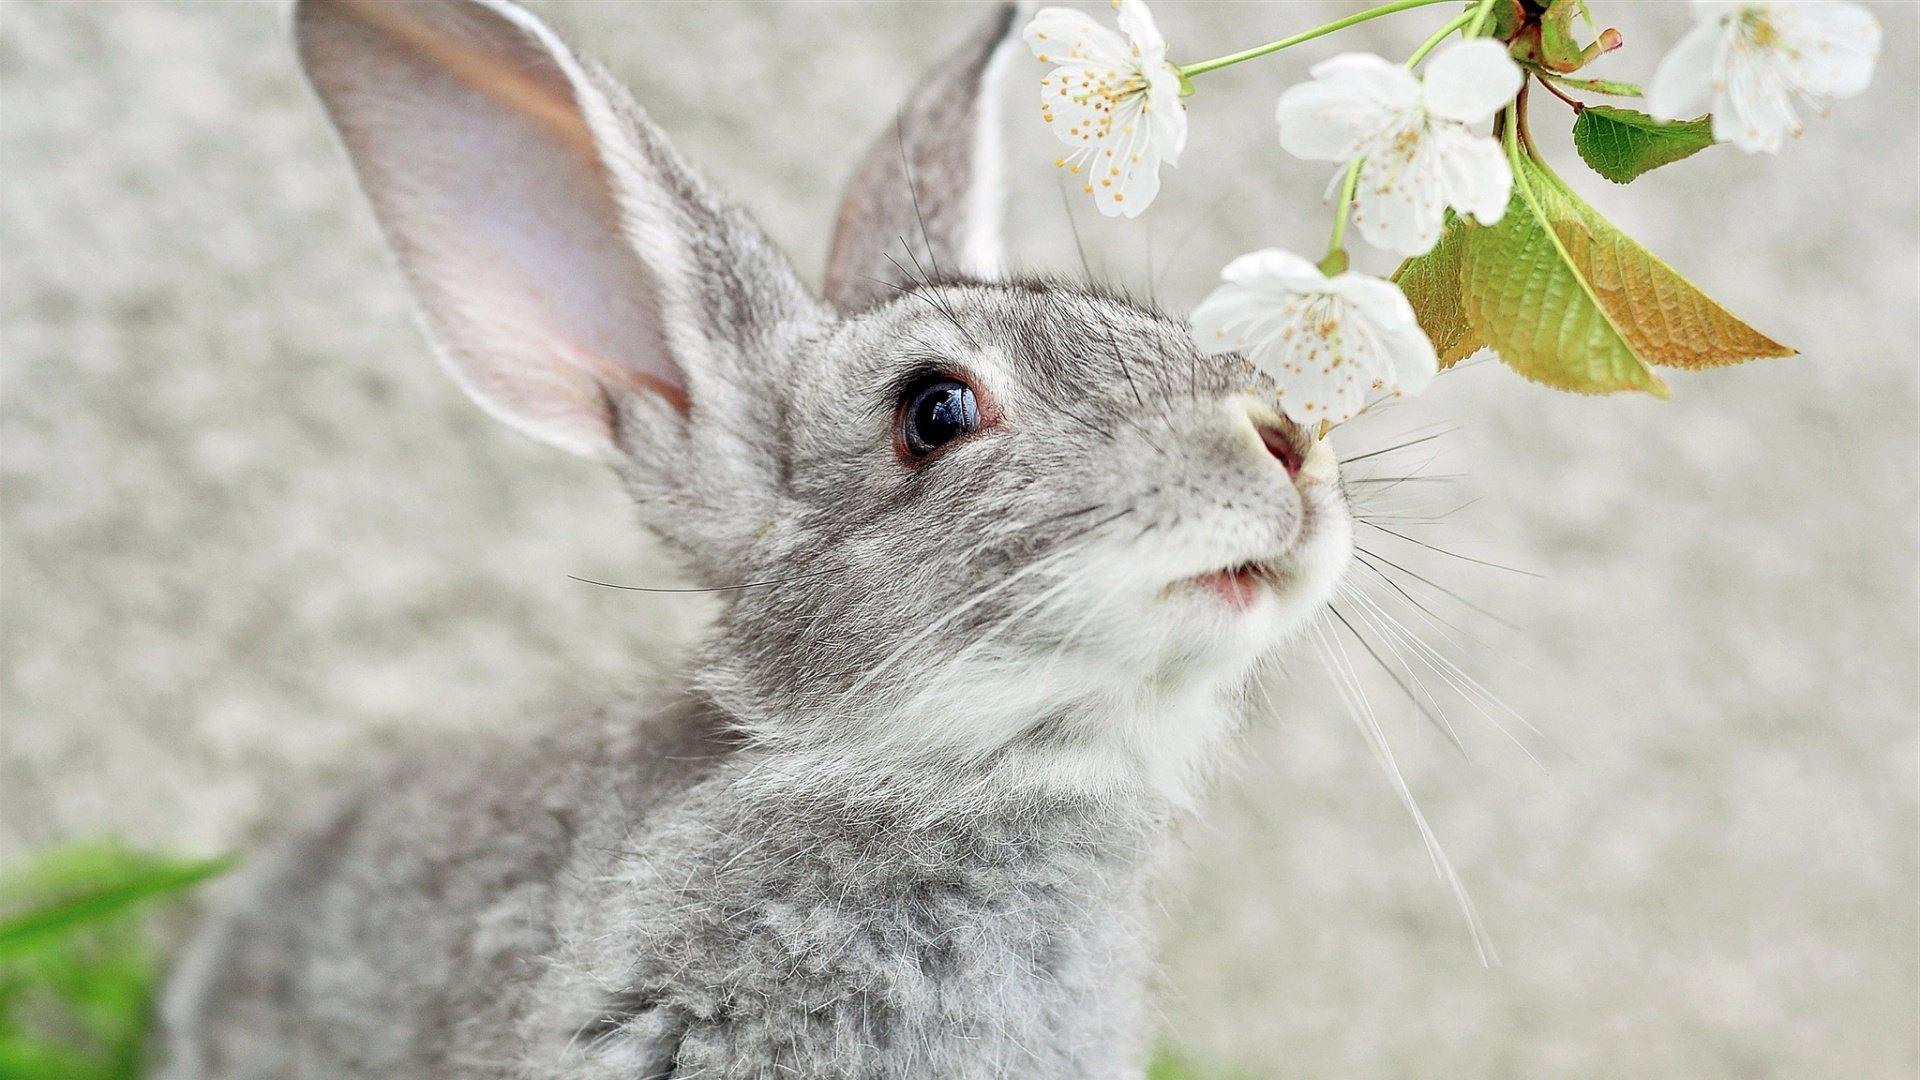 Cute White Rabbit Wallpapers For Desktop: Cute Rabbits HD Wallpaper